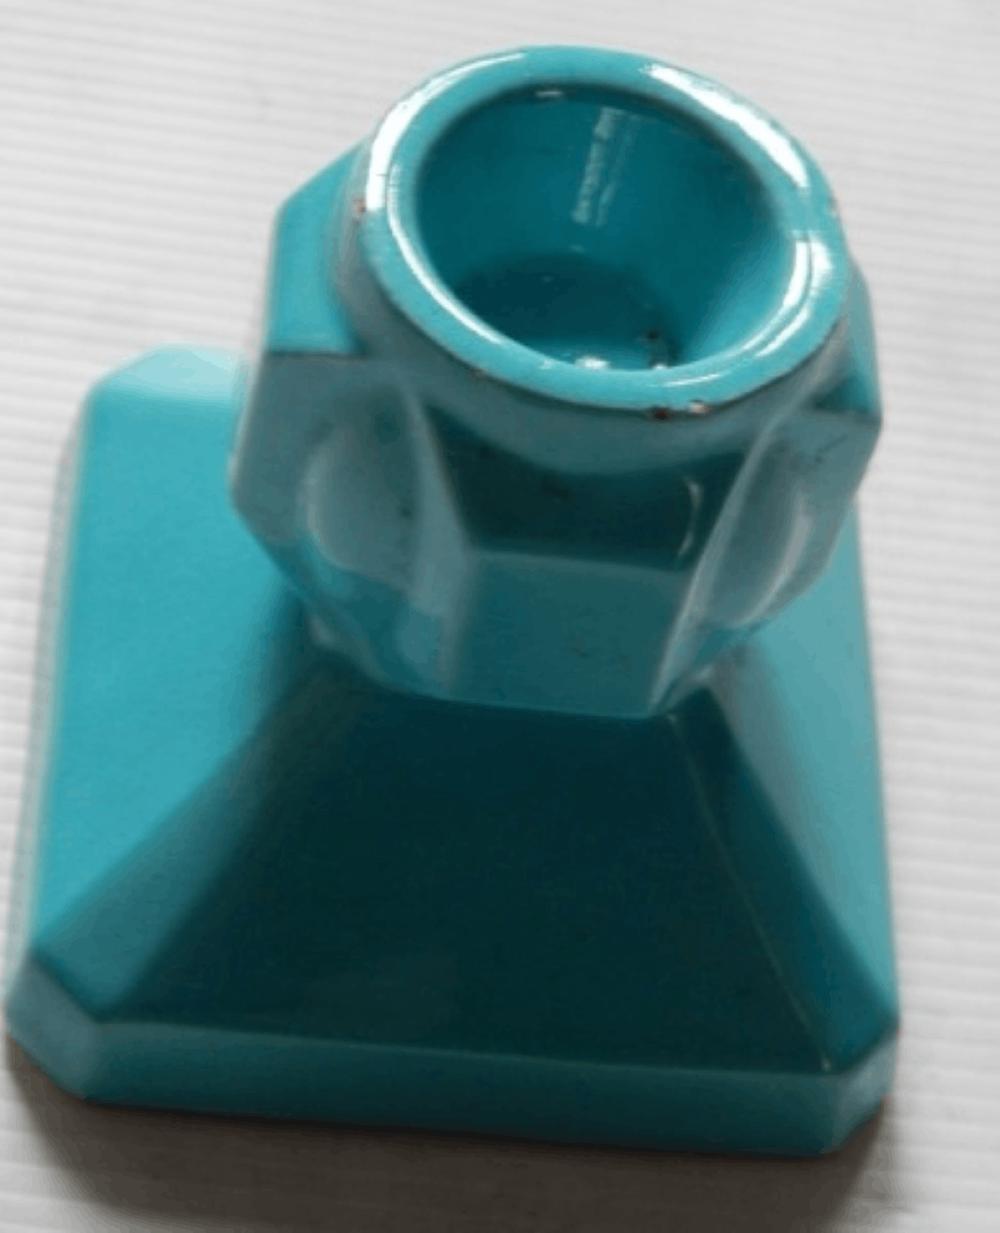 Kleiner ArtDeco Kerzenleuchter,Keramik,blau lasiert,Höhe ca.8,5cm